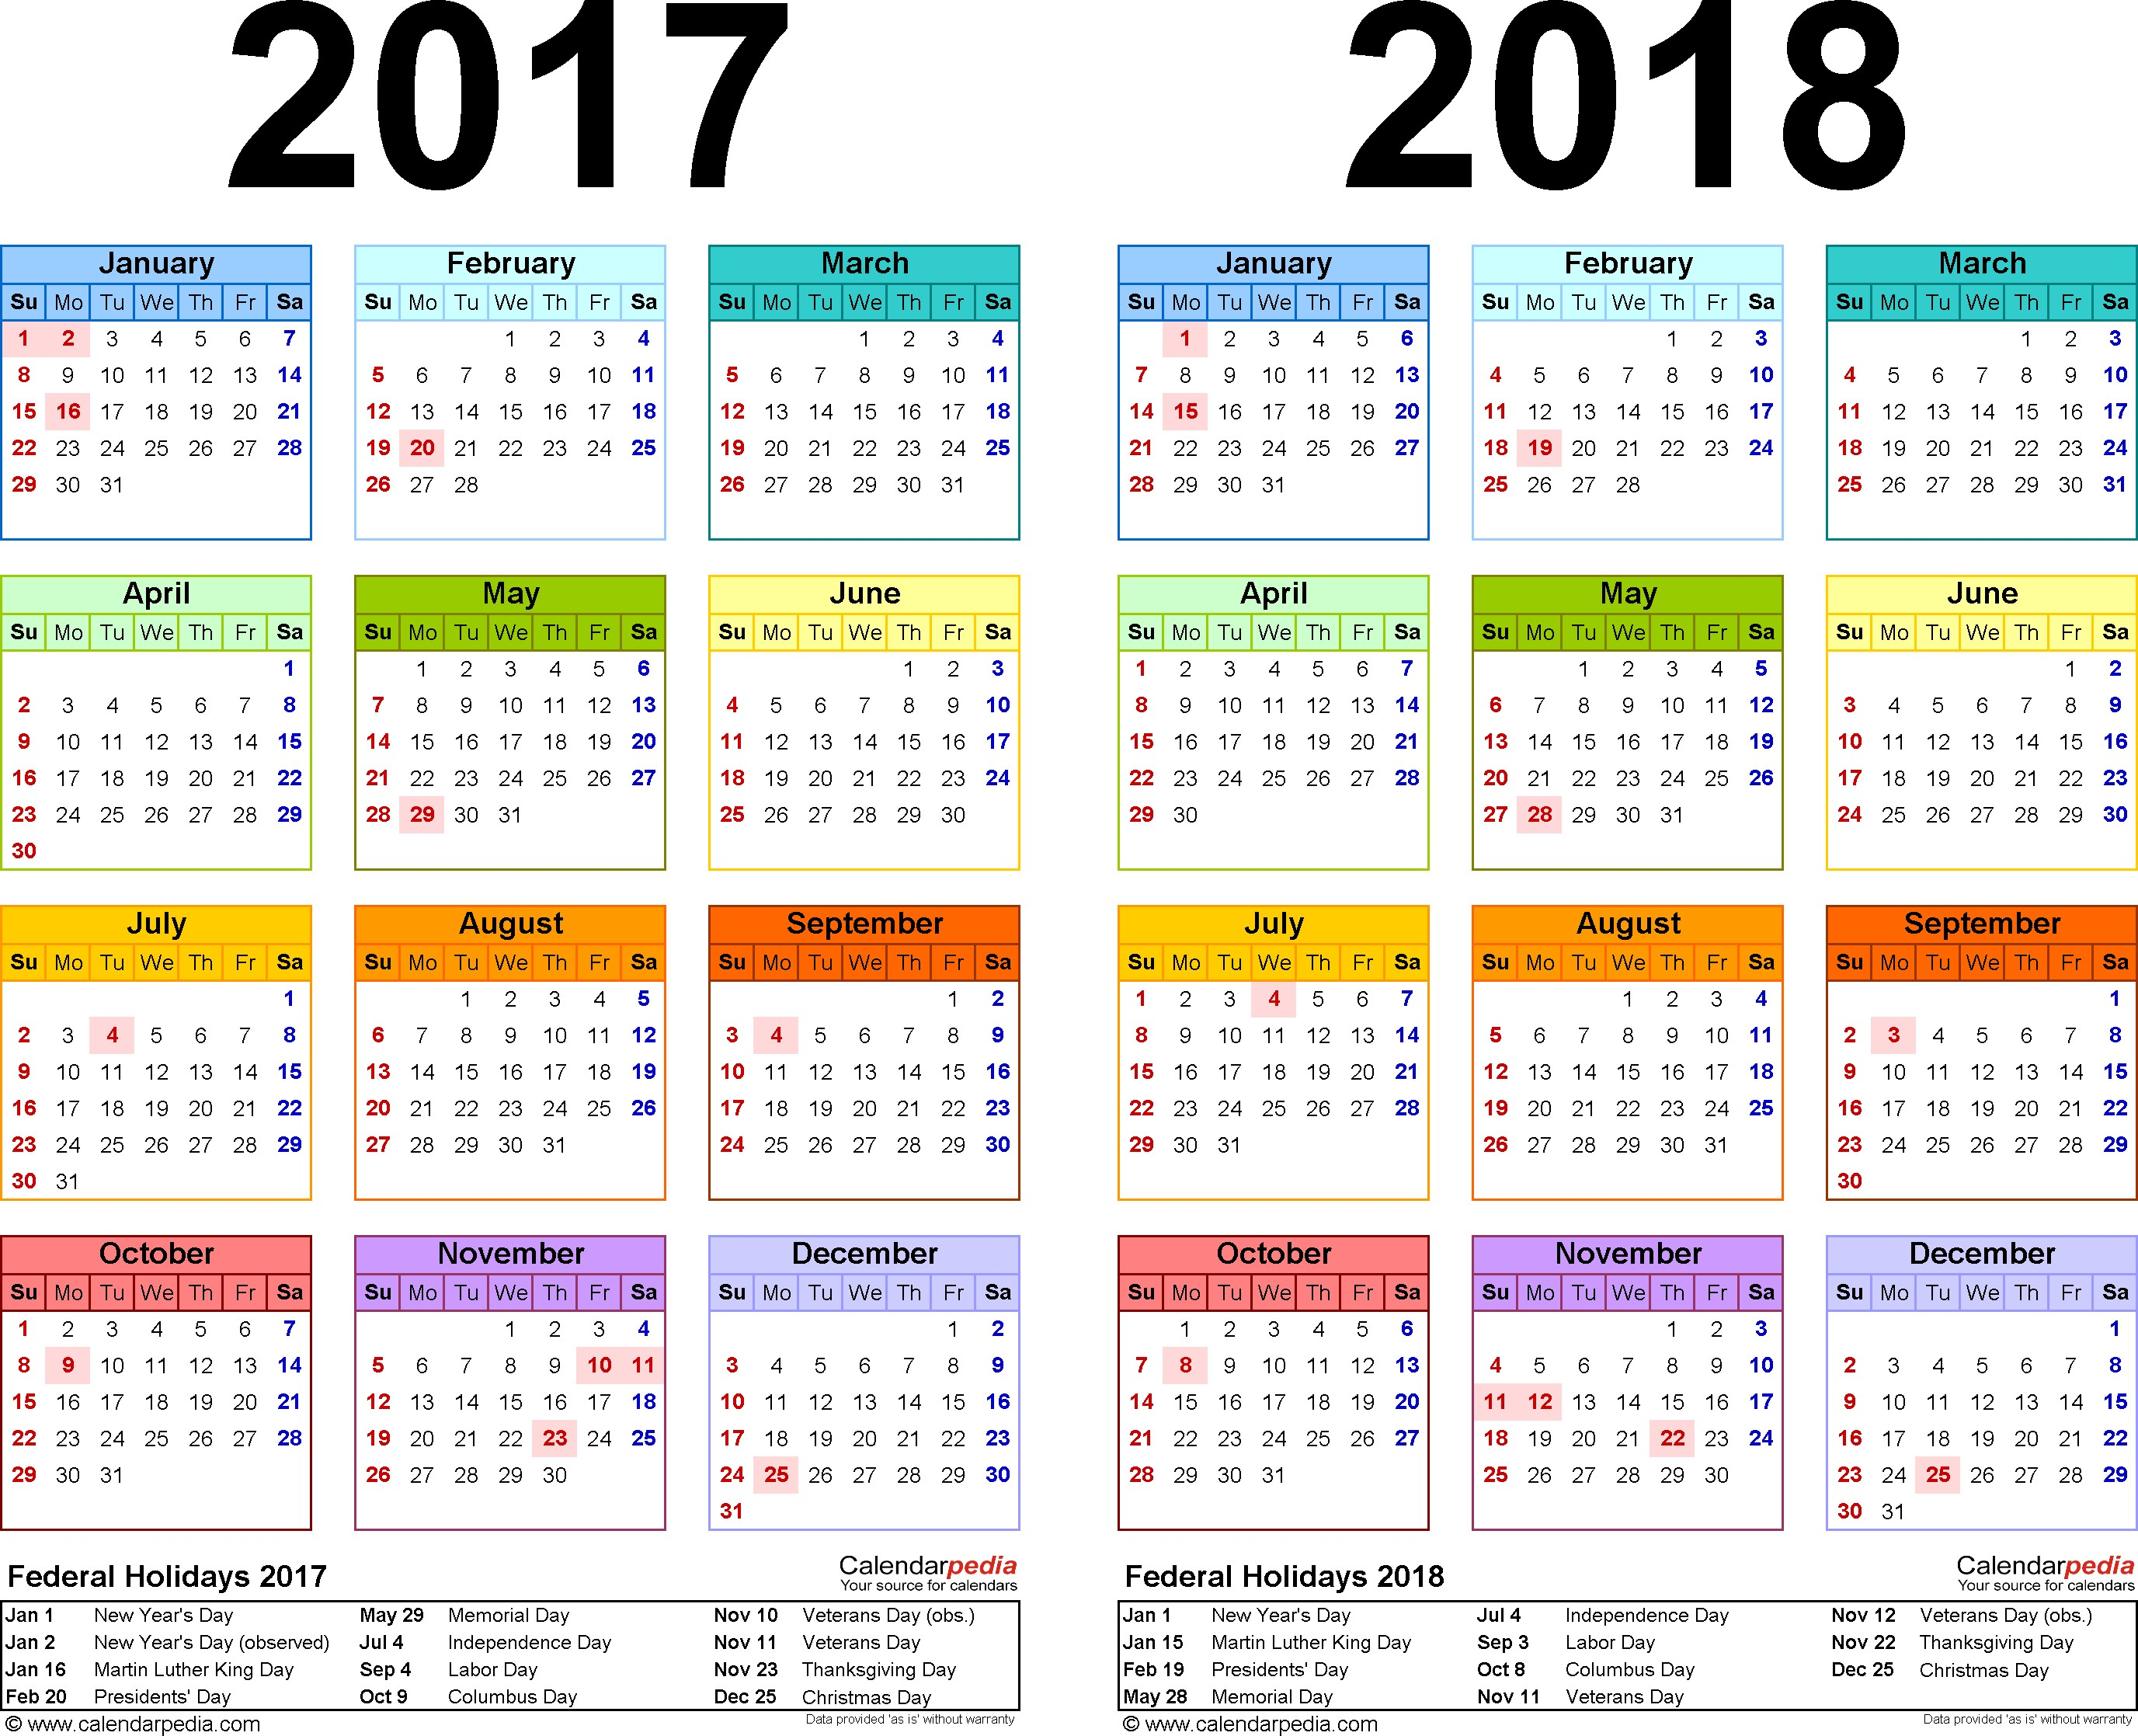 5 Year Calendar Printable 2017 2018 Calendar Free Printable Two Year Pdf Calendars